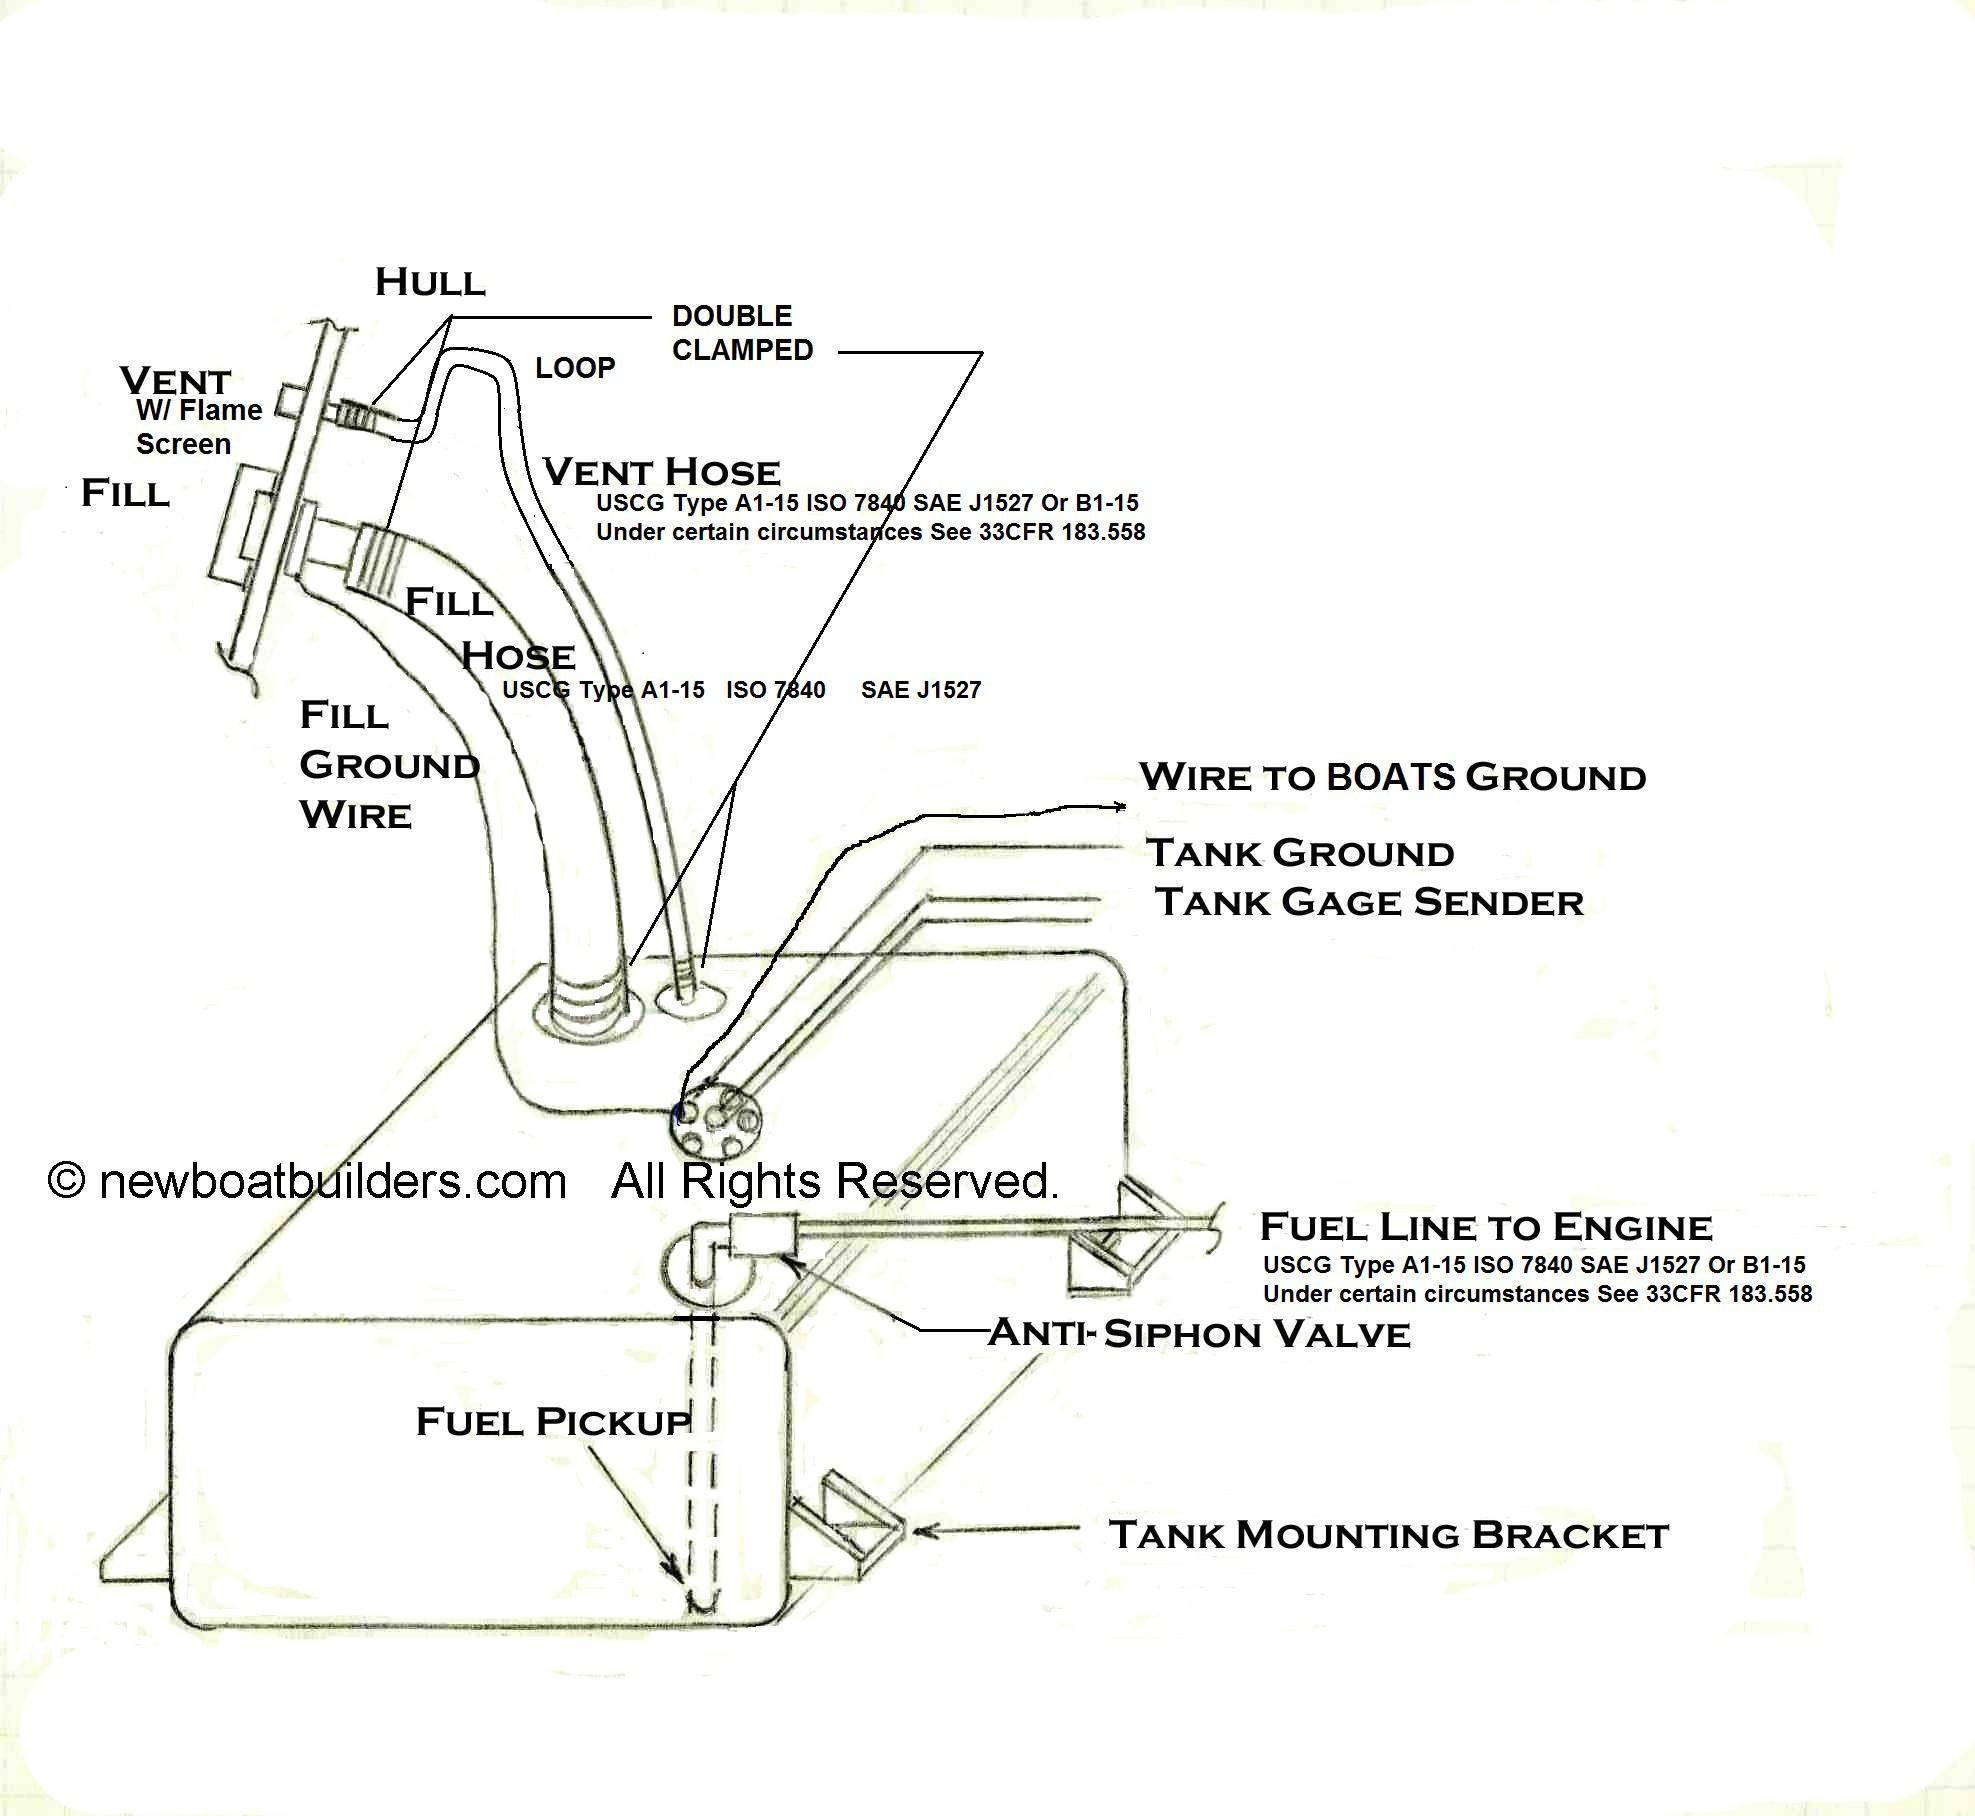 mercedes sl500 wiring diagram 2003 mitsubishi lancer car radio stereo audio fuel system | my